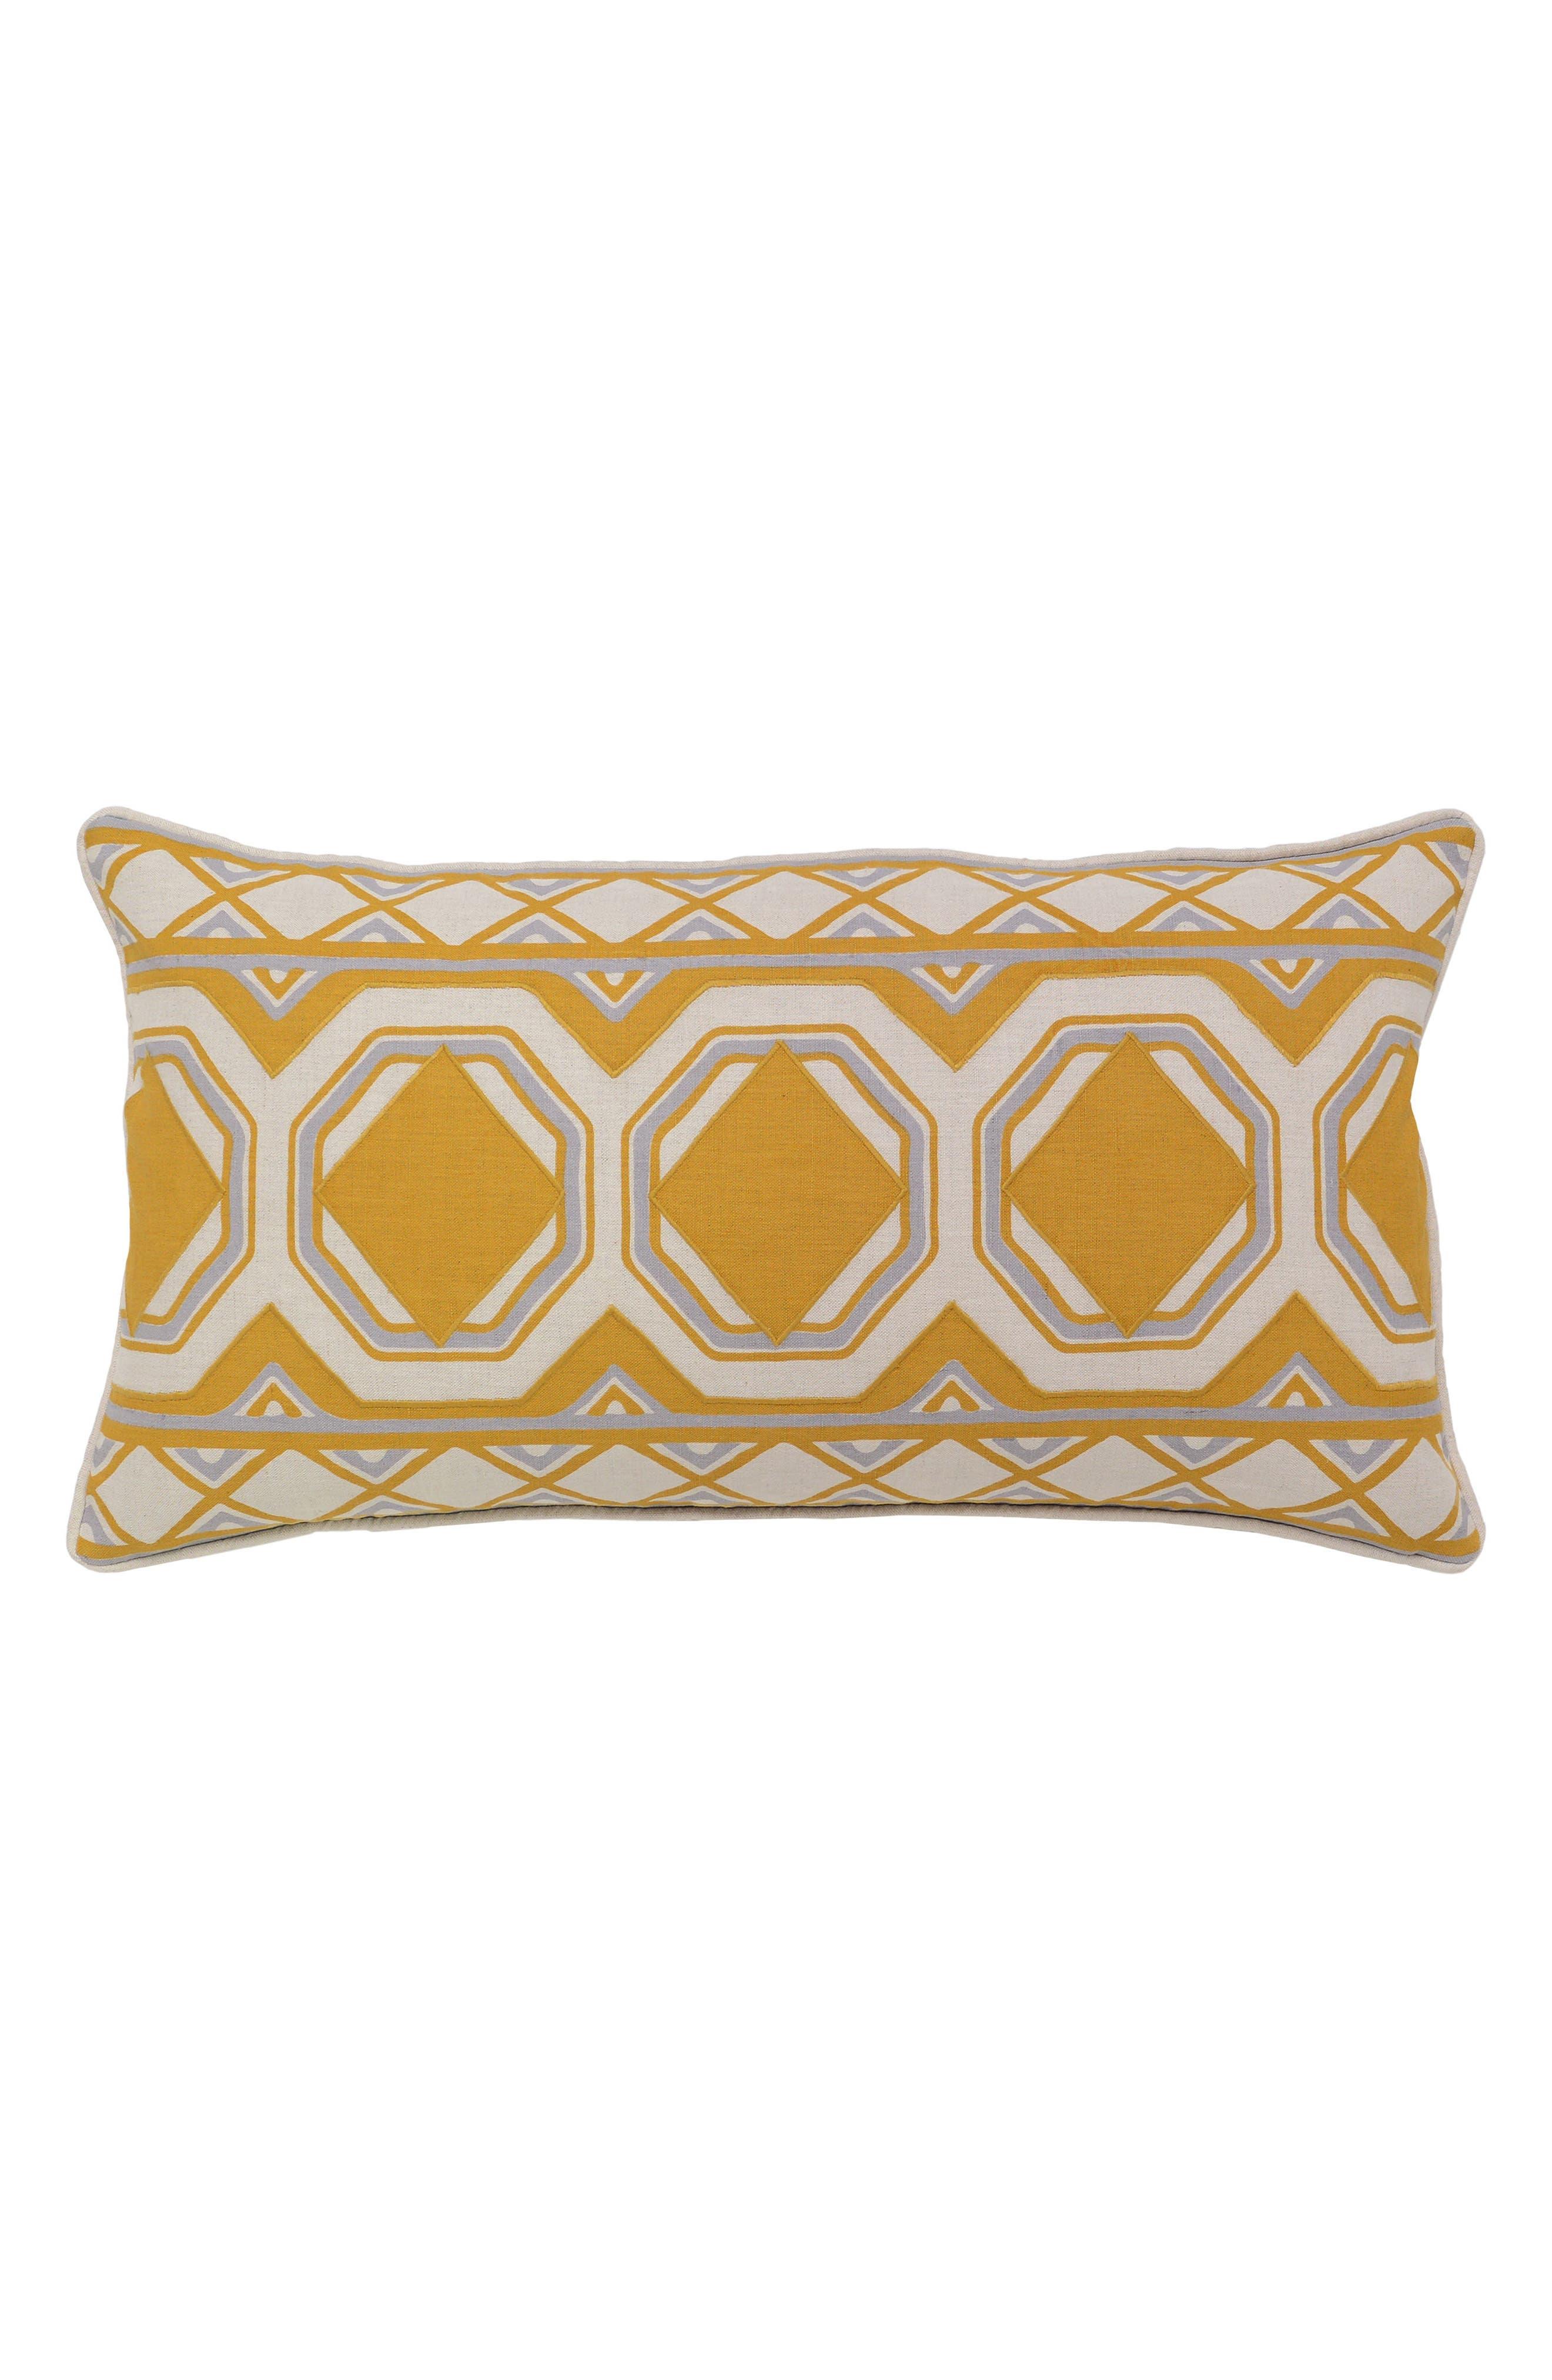 Villa Home Collection Cheval Accent Pillow